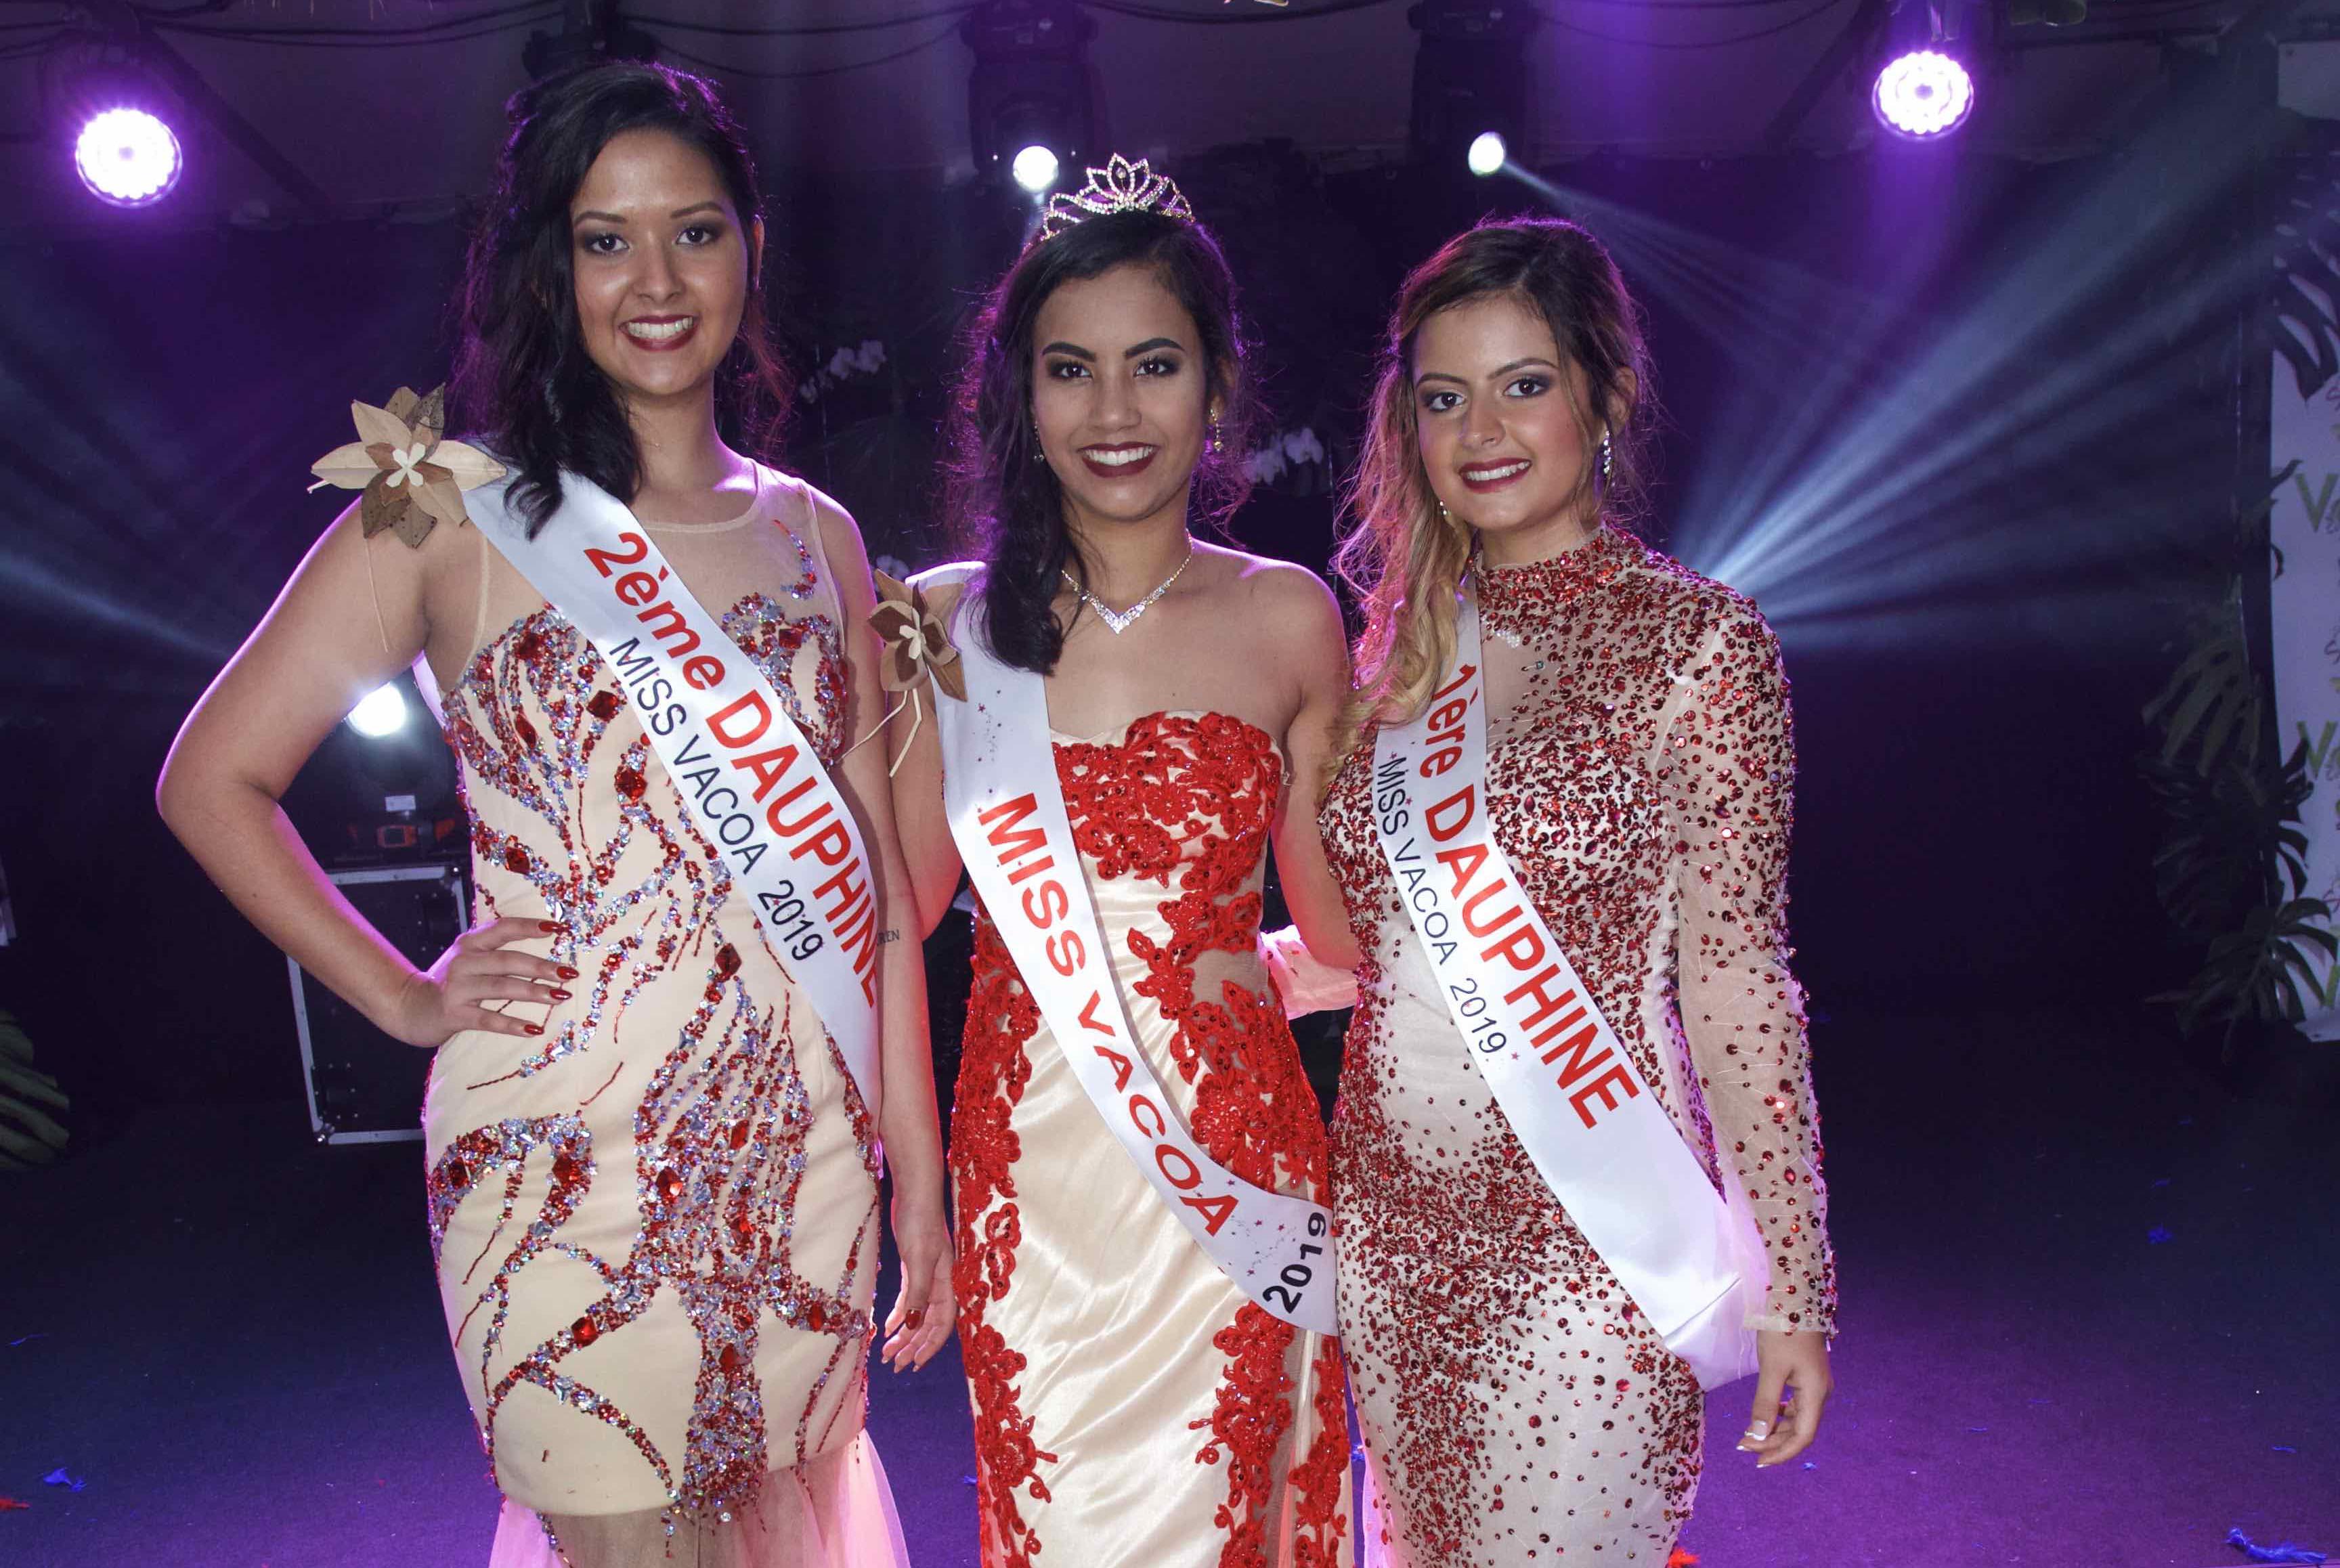 Gwendoline Fontaine, 2ème dauphine, Frideline Mouniama, Miss Vacoa 2019, et Flora Olivar, 1ère dauphine